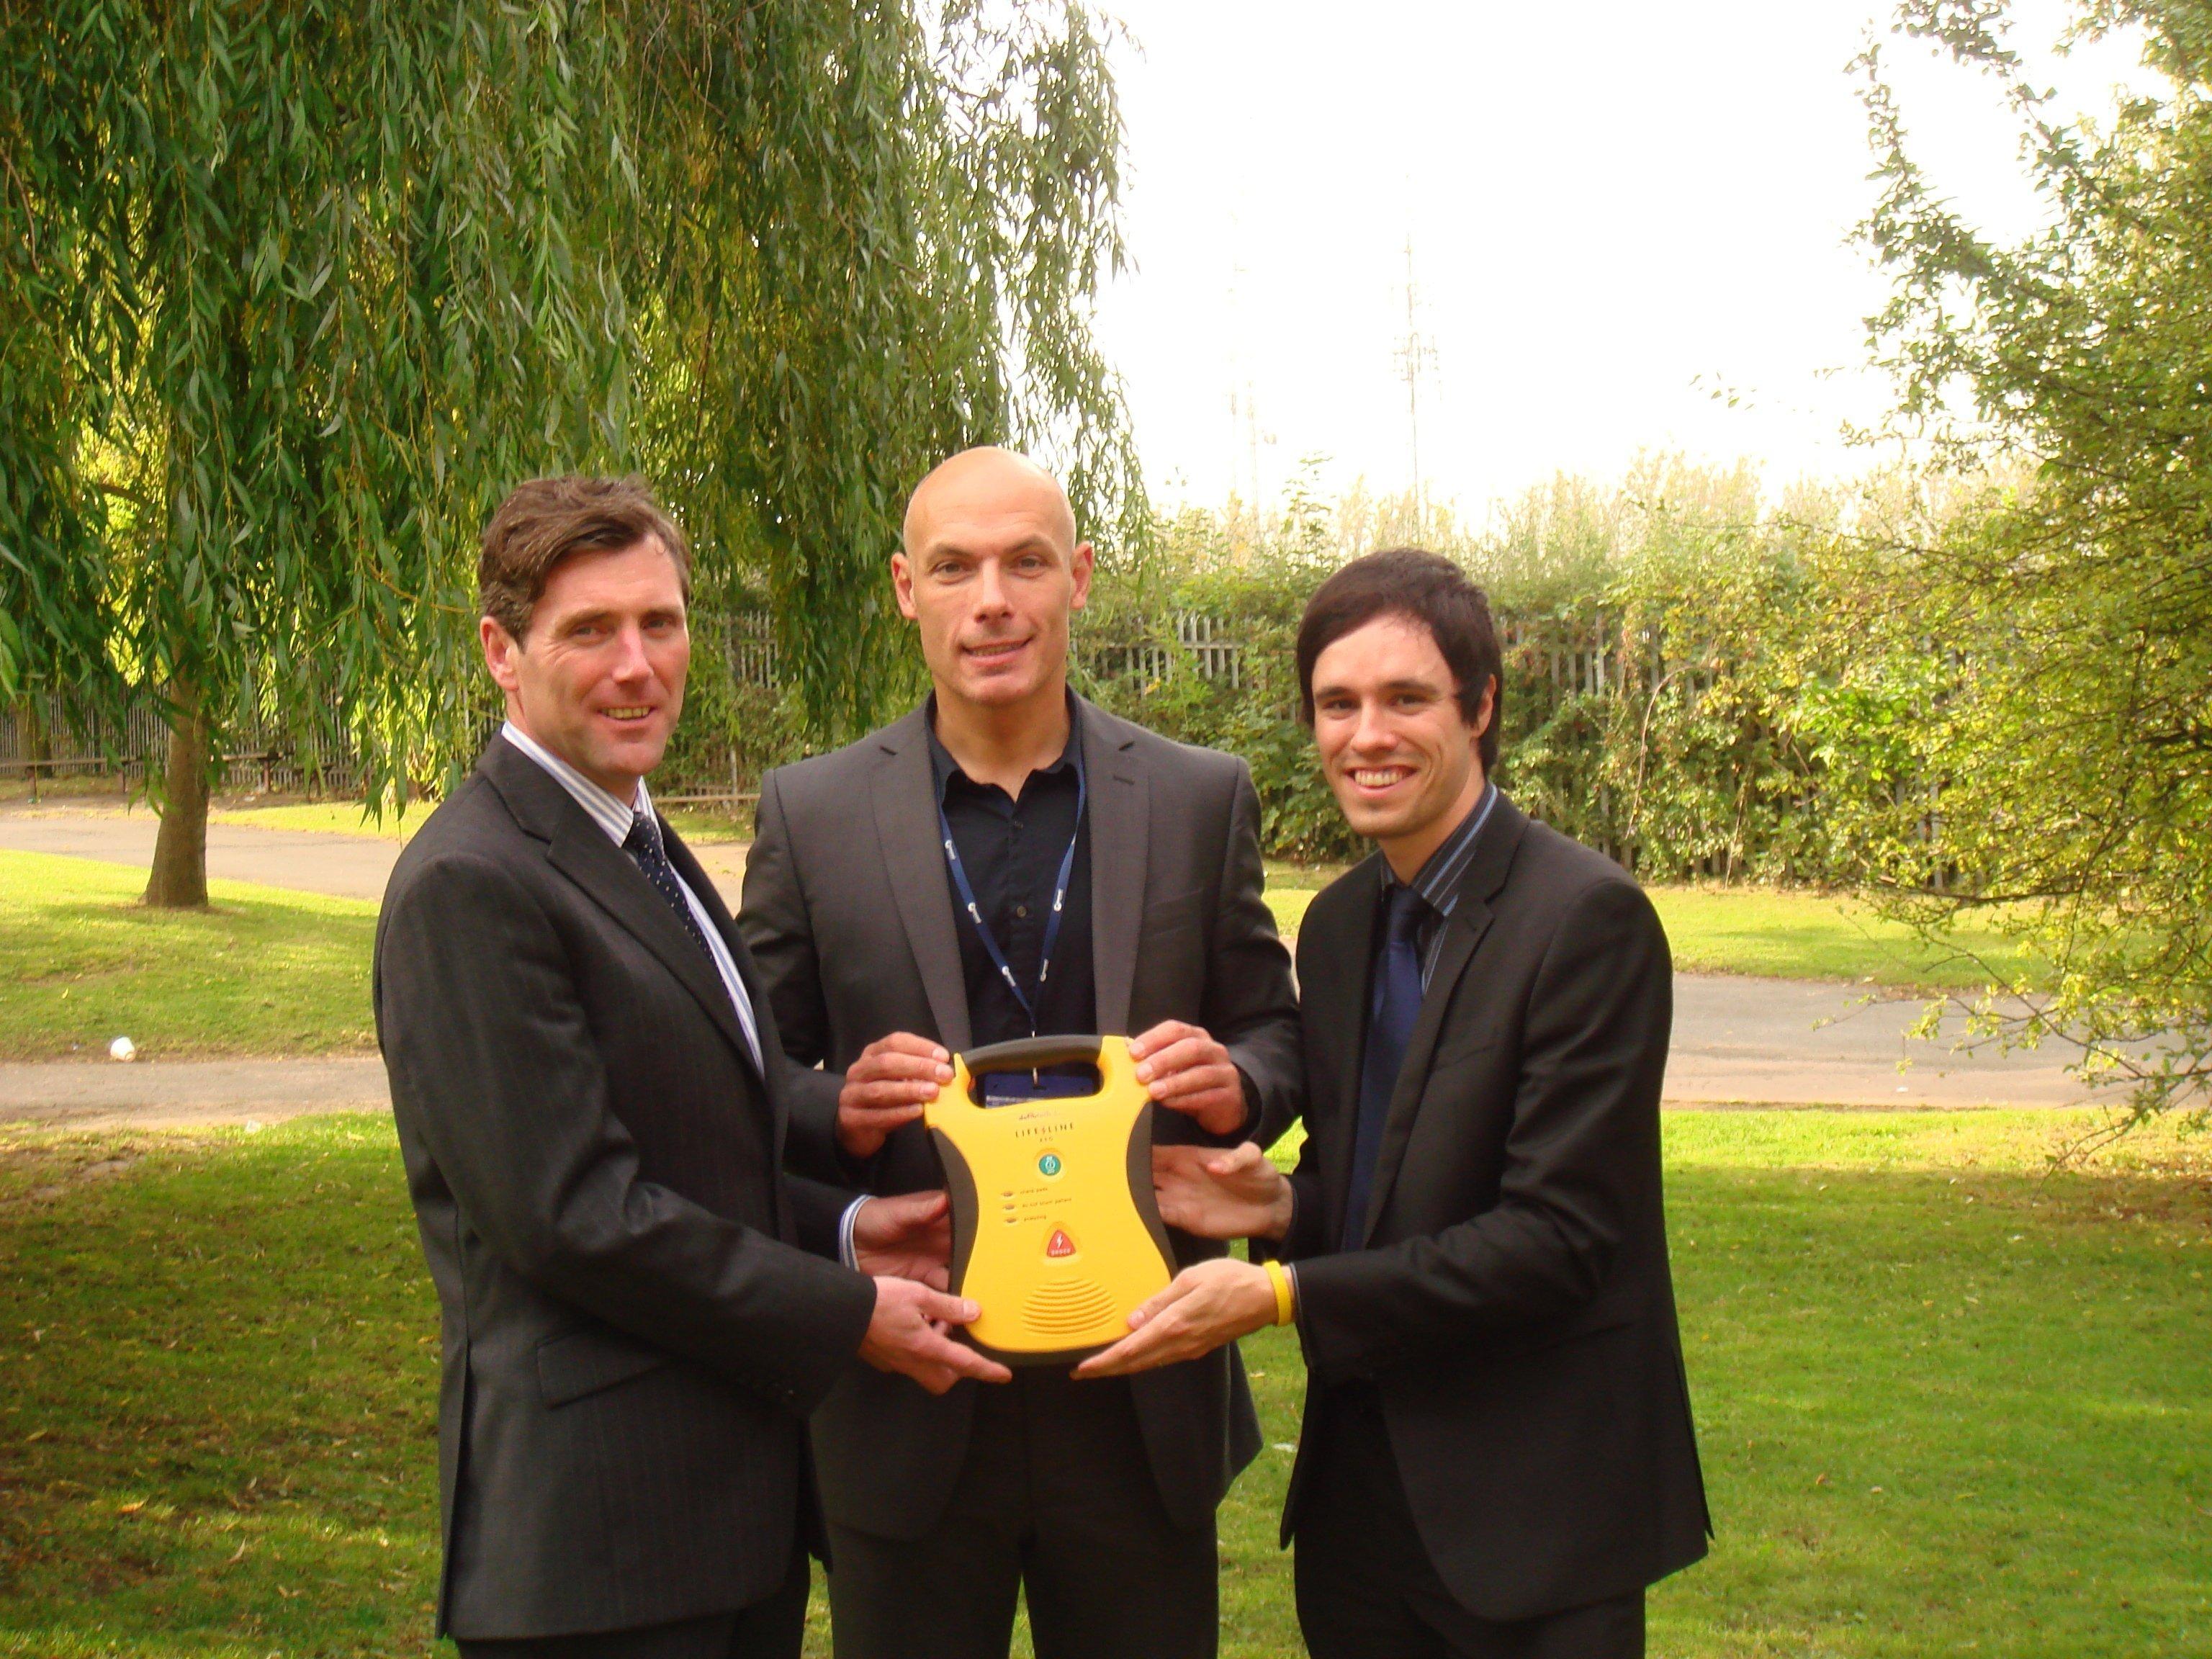 Ian, Howard Webb & David of Oakwood School 2